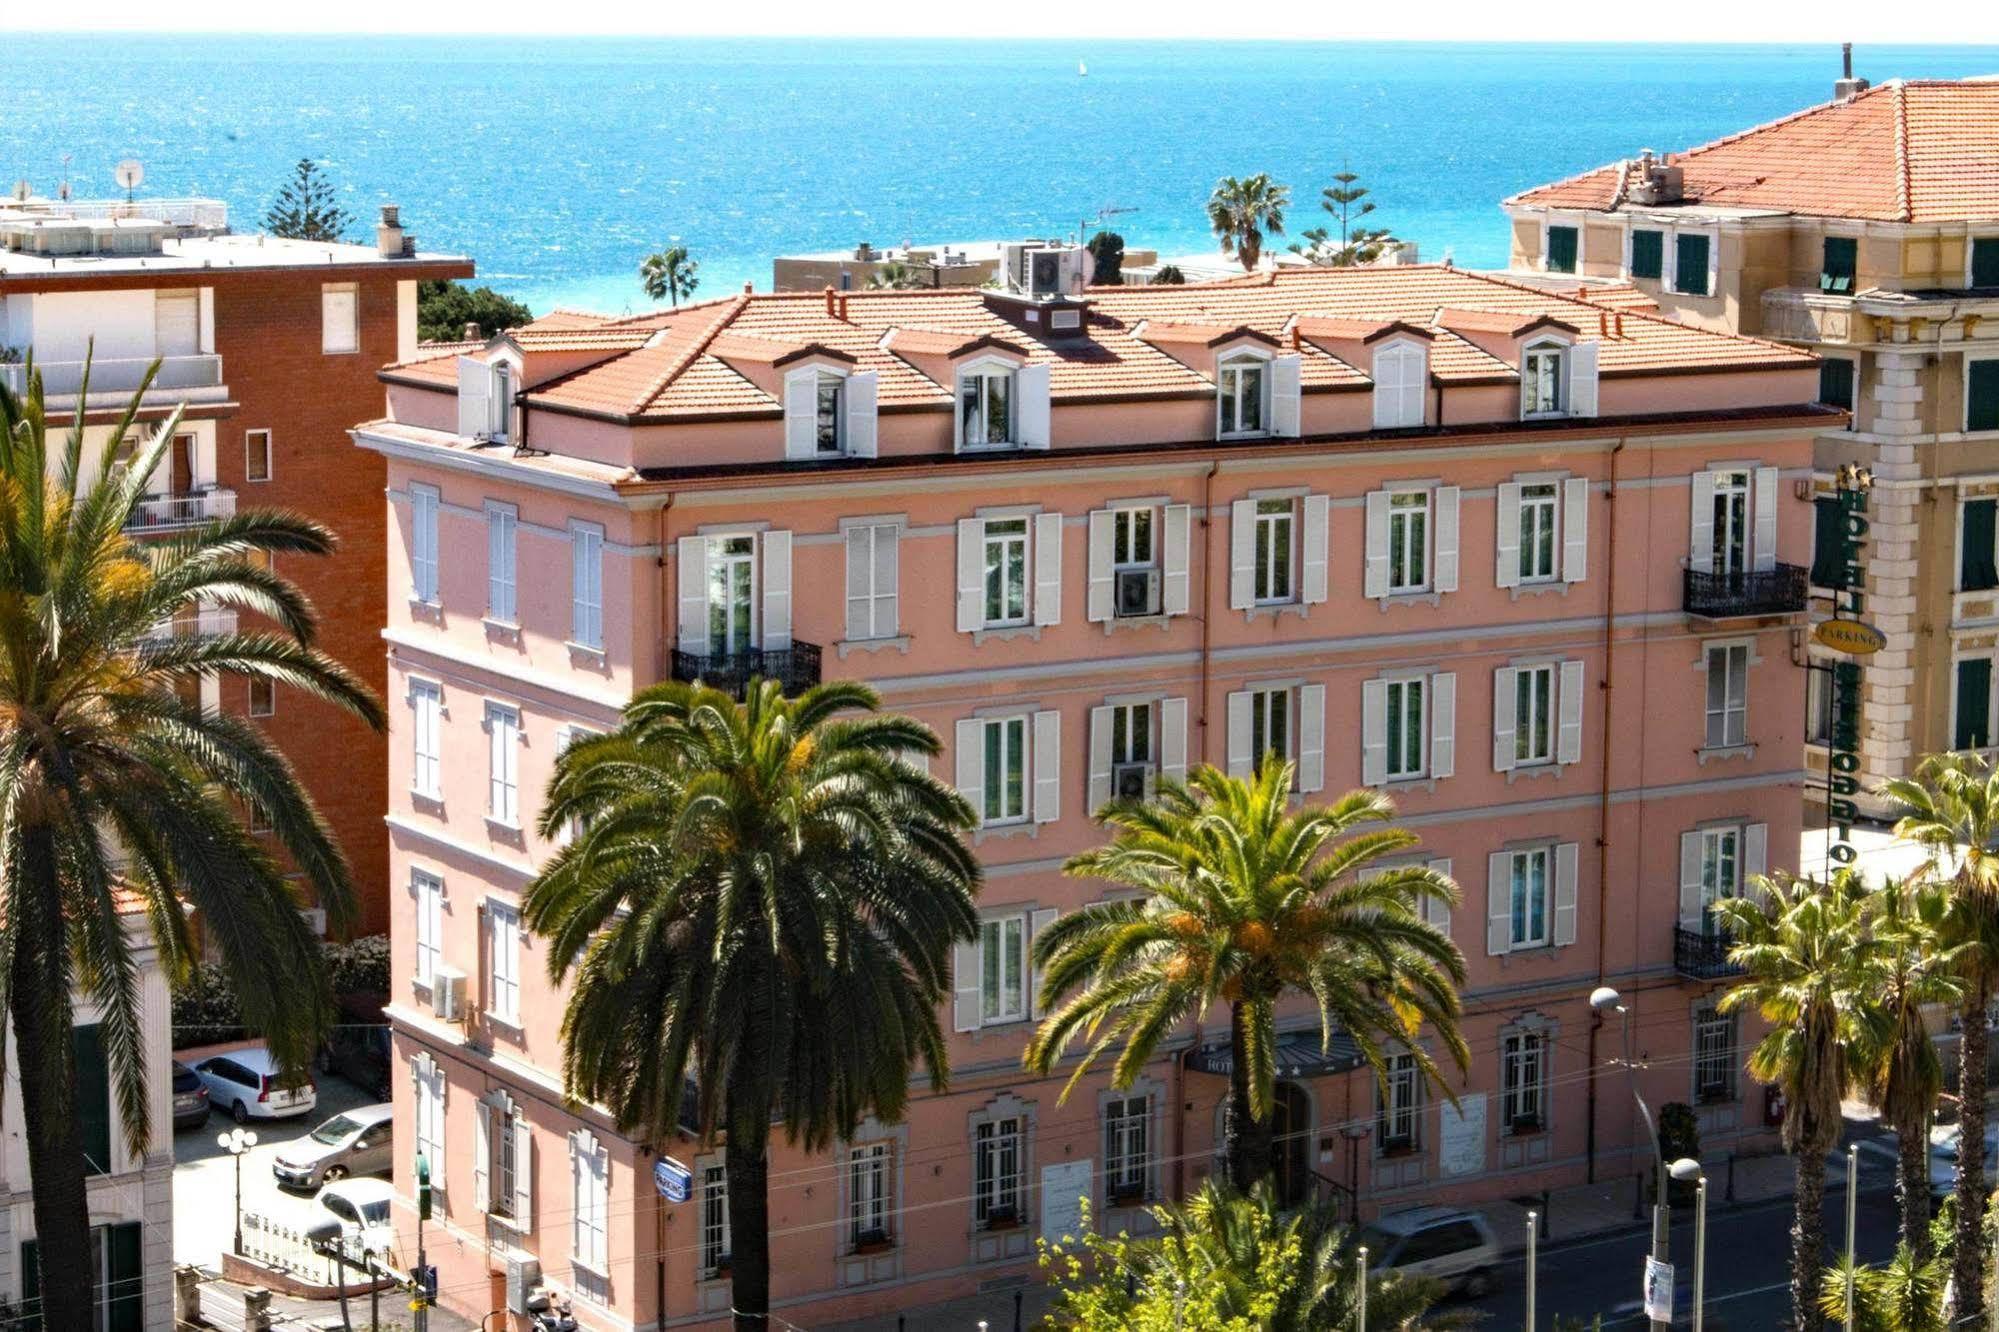 Belsoggiorno, Sanremo da € 36 - Logitravel